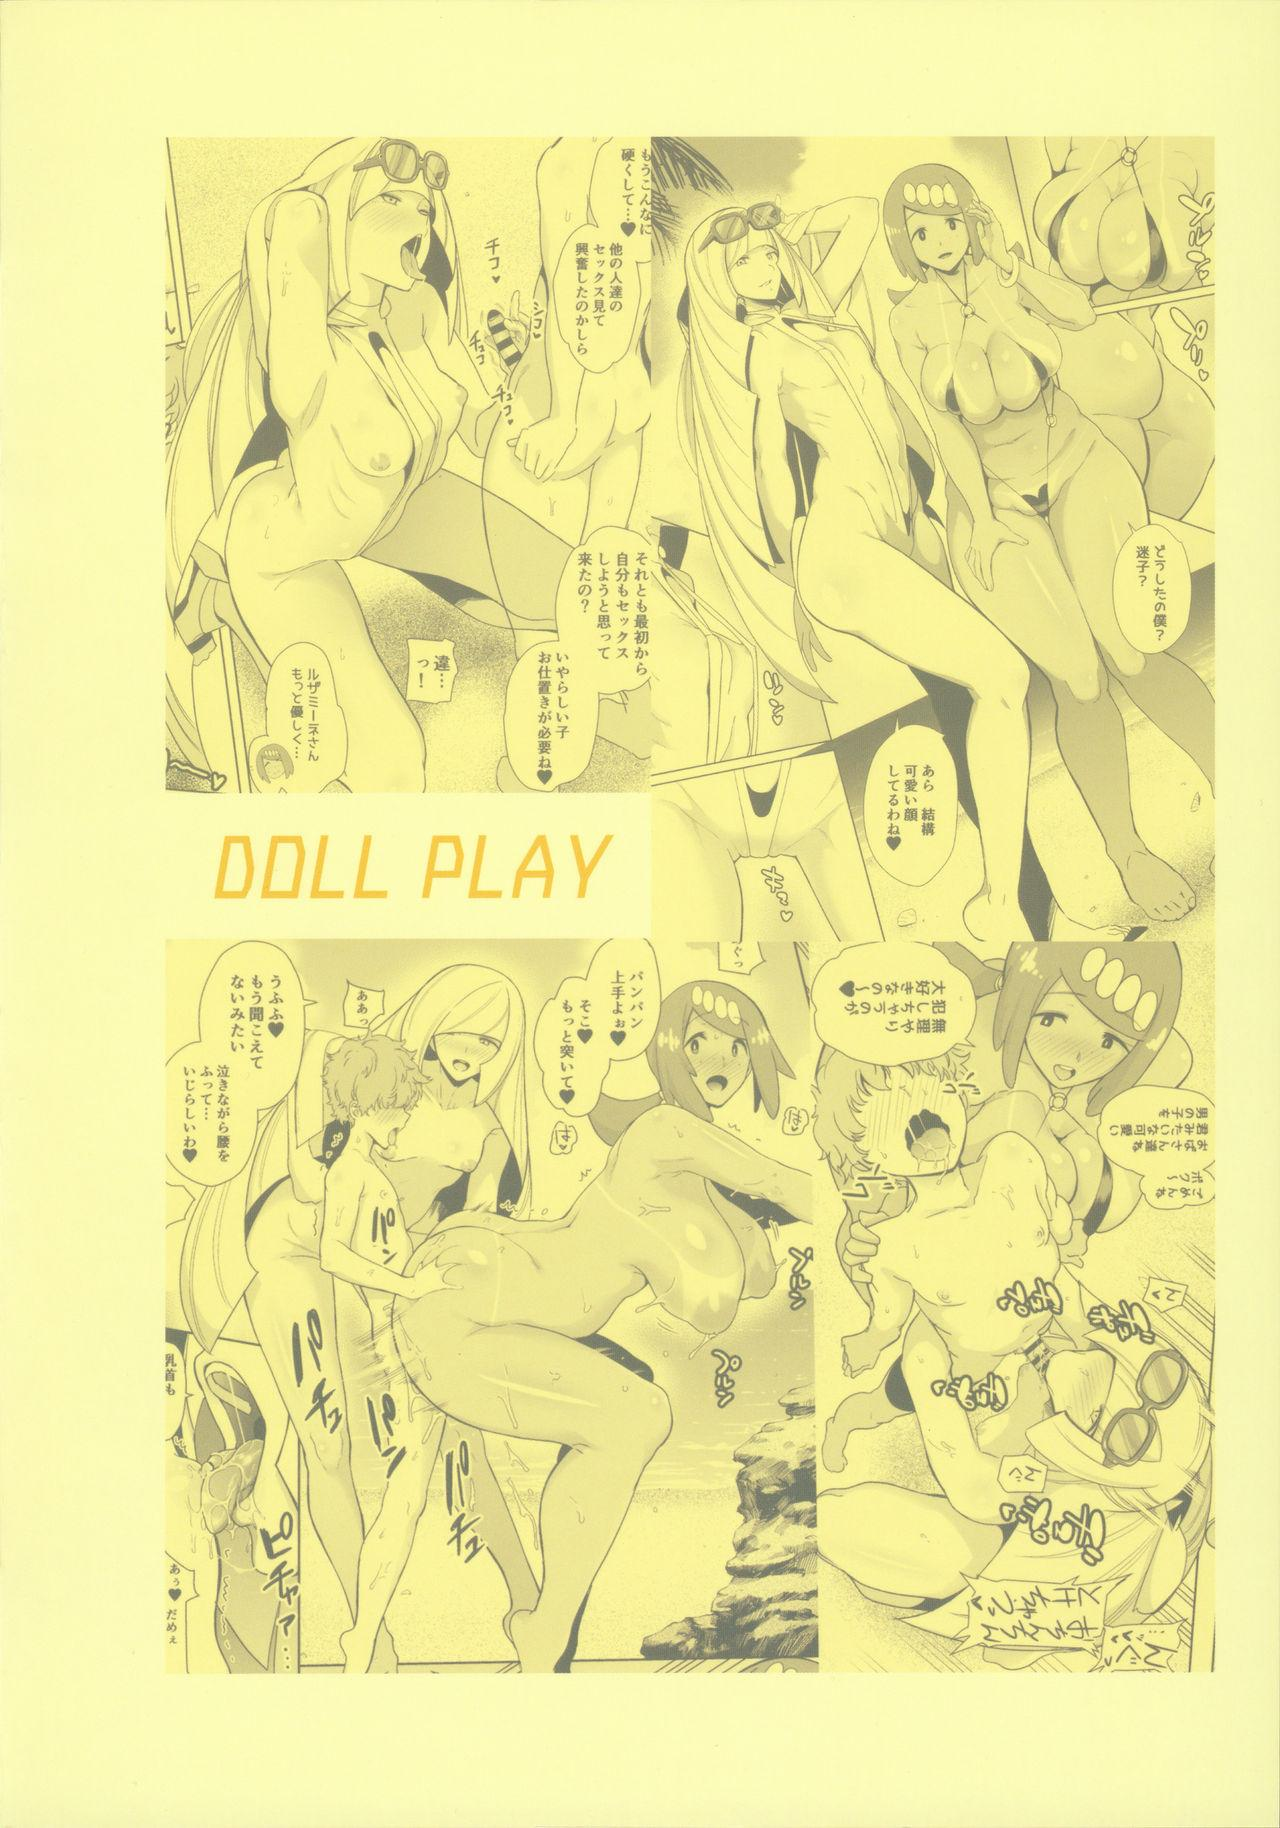 (SC2019 Spring) [DOLL PLAY (Kurosu Gatari)] Alola no Yoru no Sugata 3 (Pokémon Sun and Moon) | The Feeling of Alolan Night 3 [English] [Learn JP With H] 25